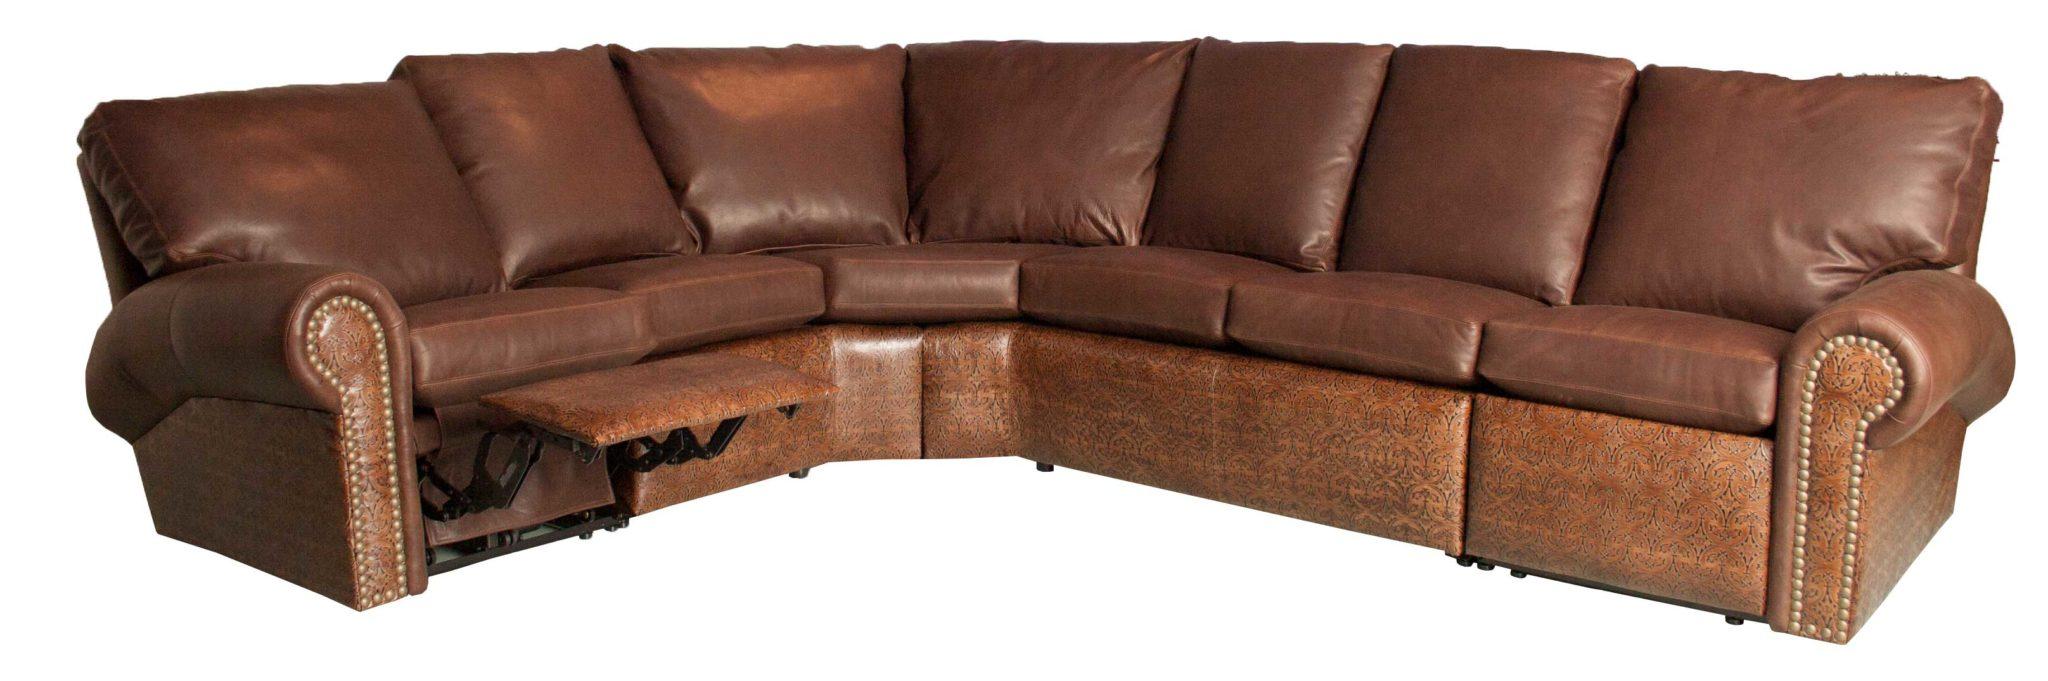 sectional sofas phoenix wood sofa set in chennai  reclining leather